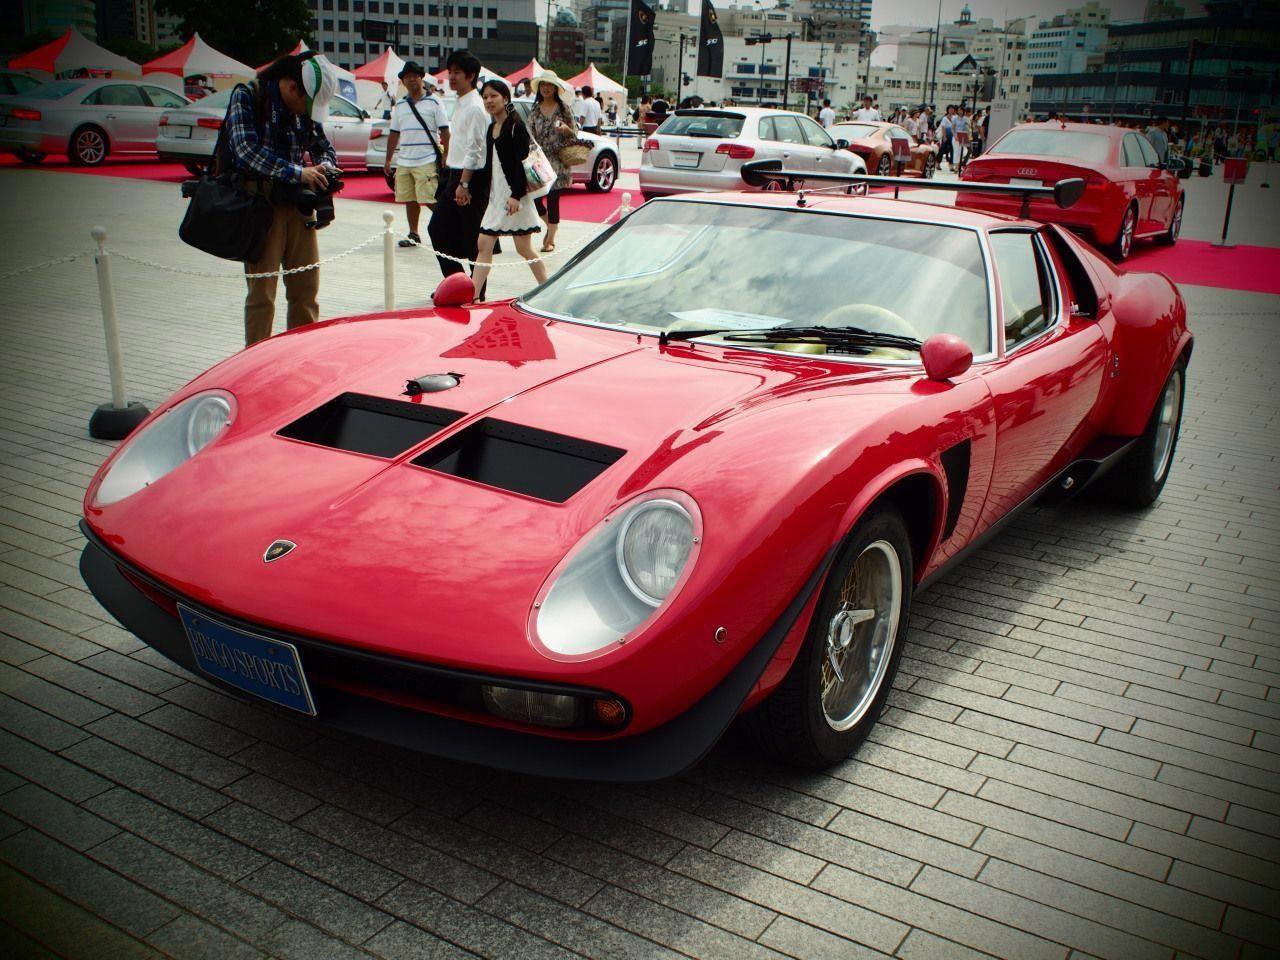 Lamborghini Miura Jota SVR Body kits in The Crew?